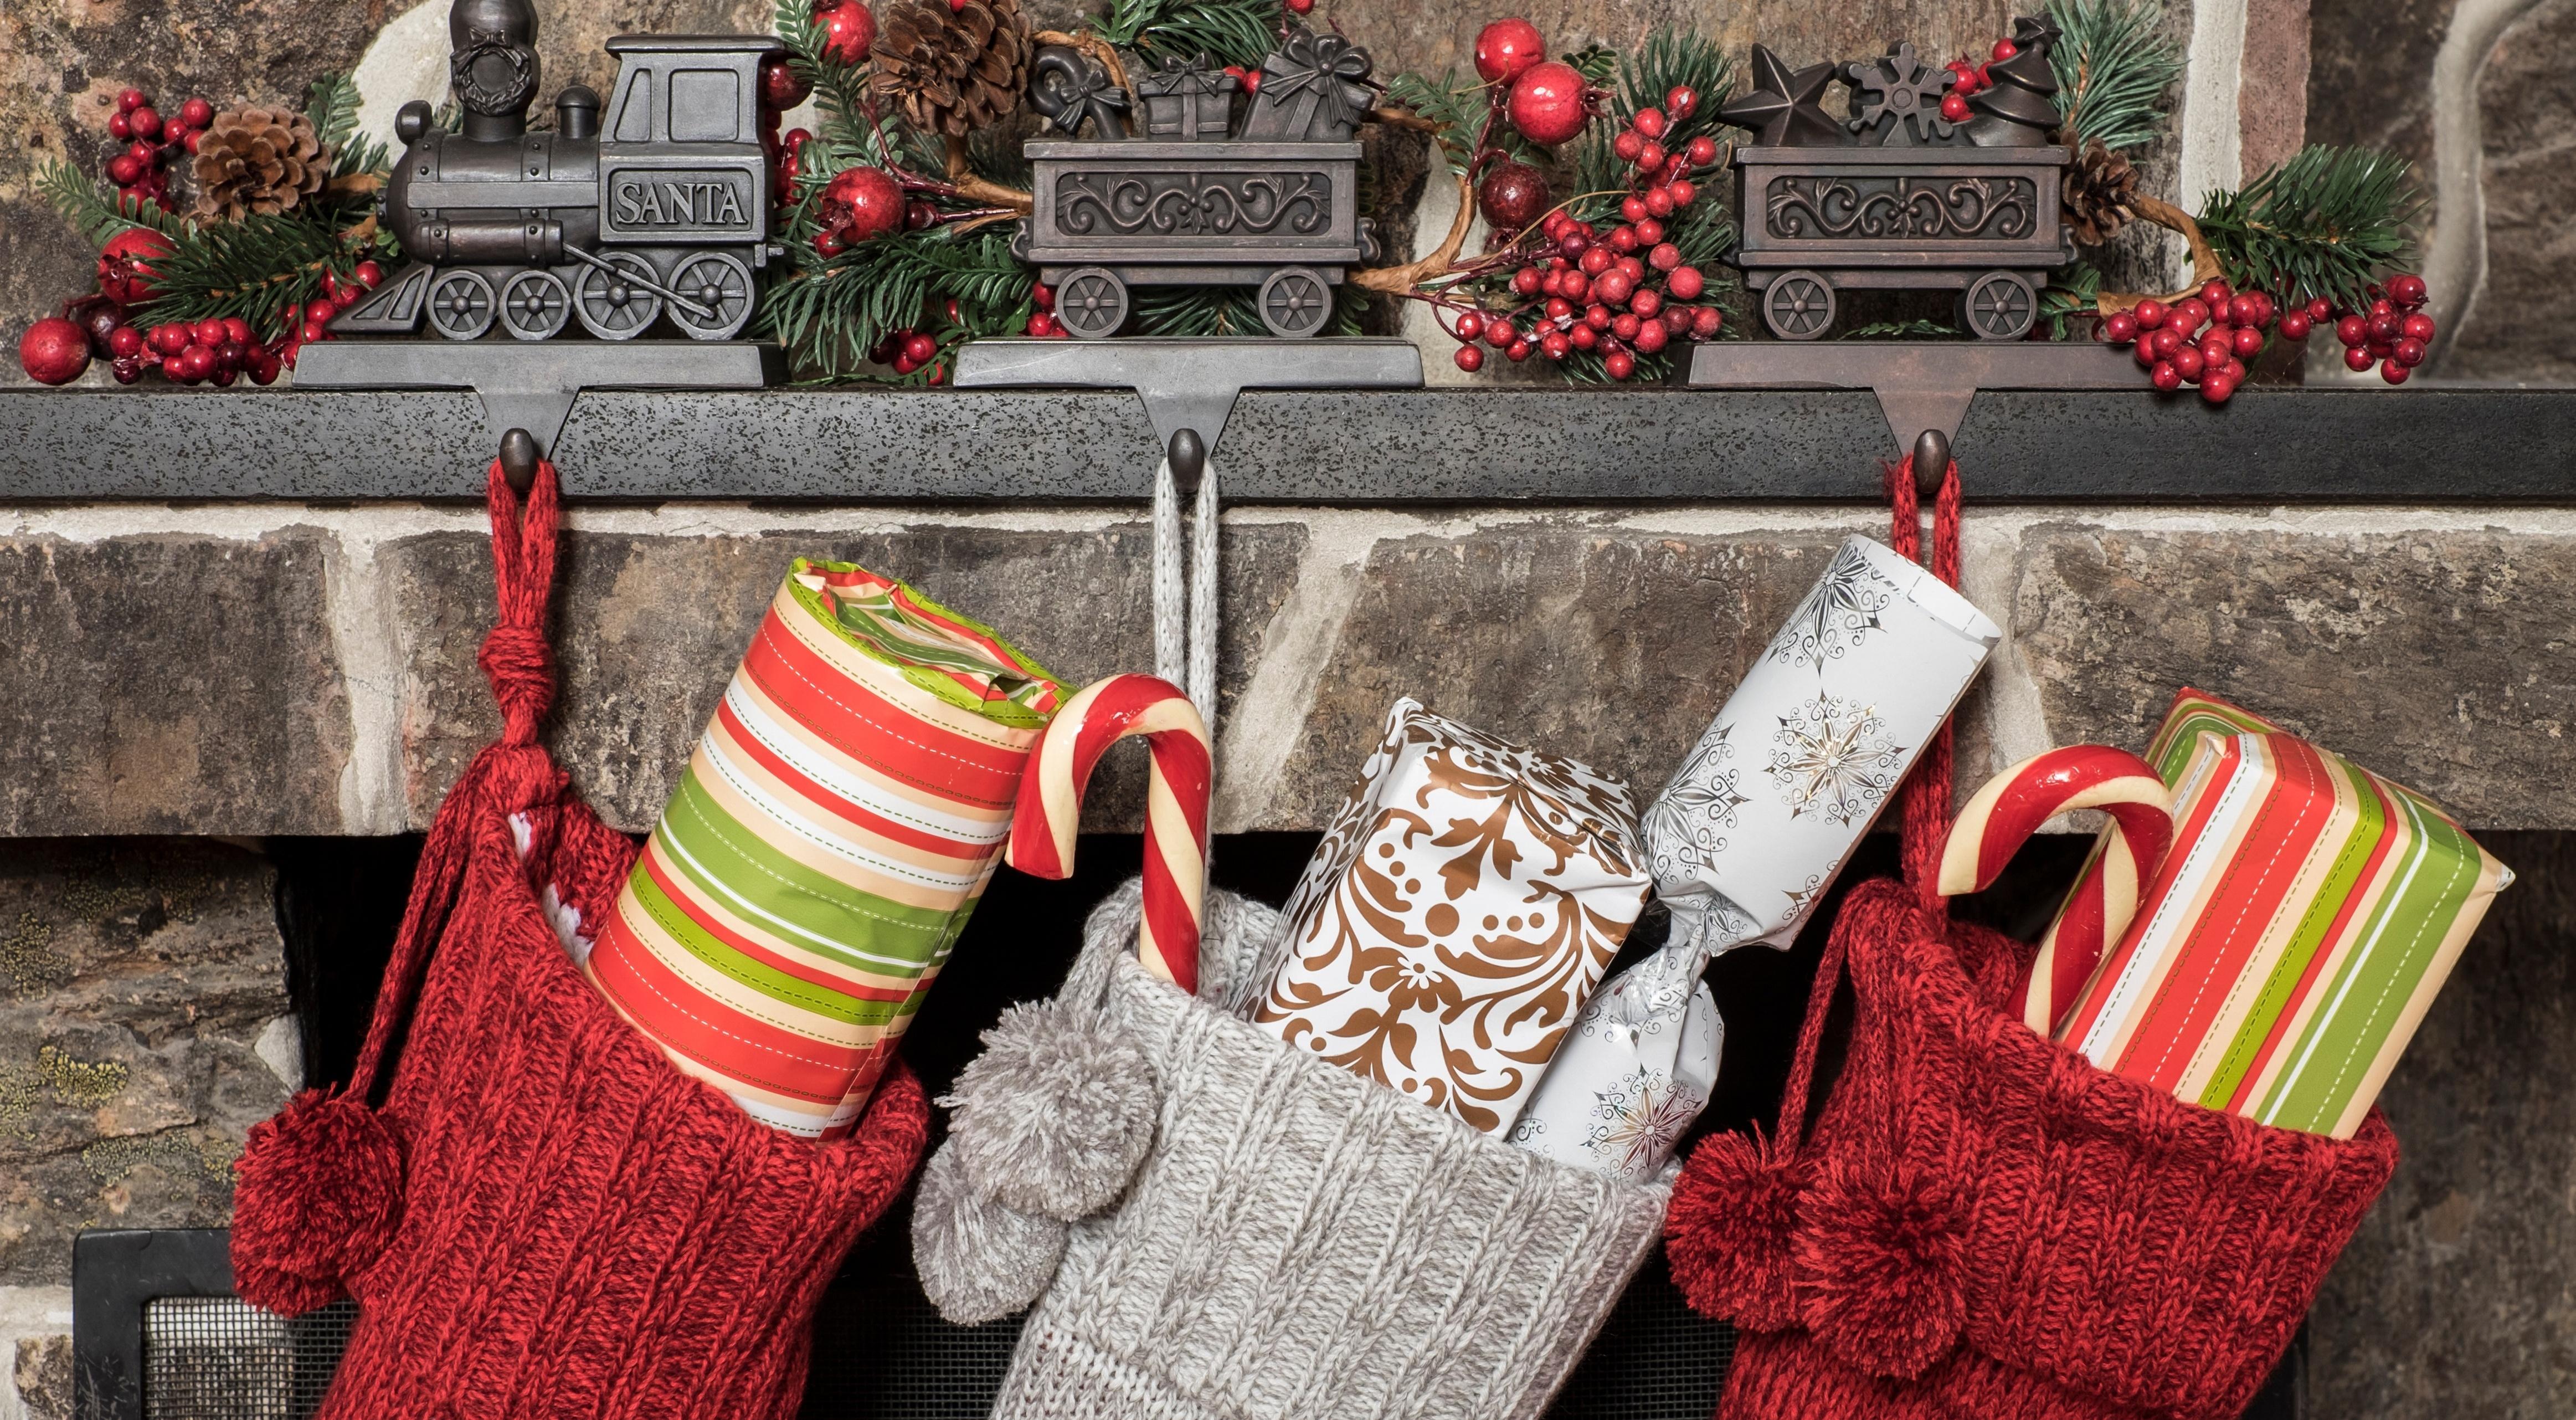 Best Stocking Stuffers Under $10